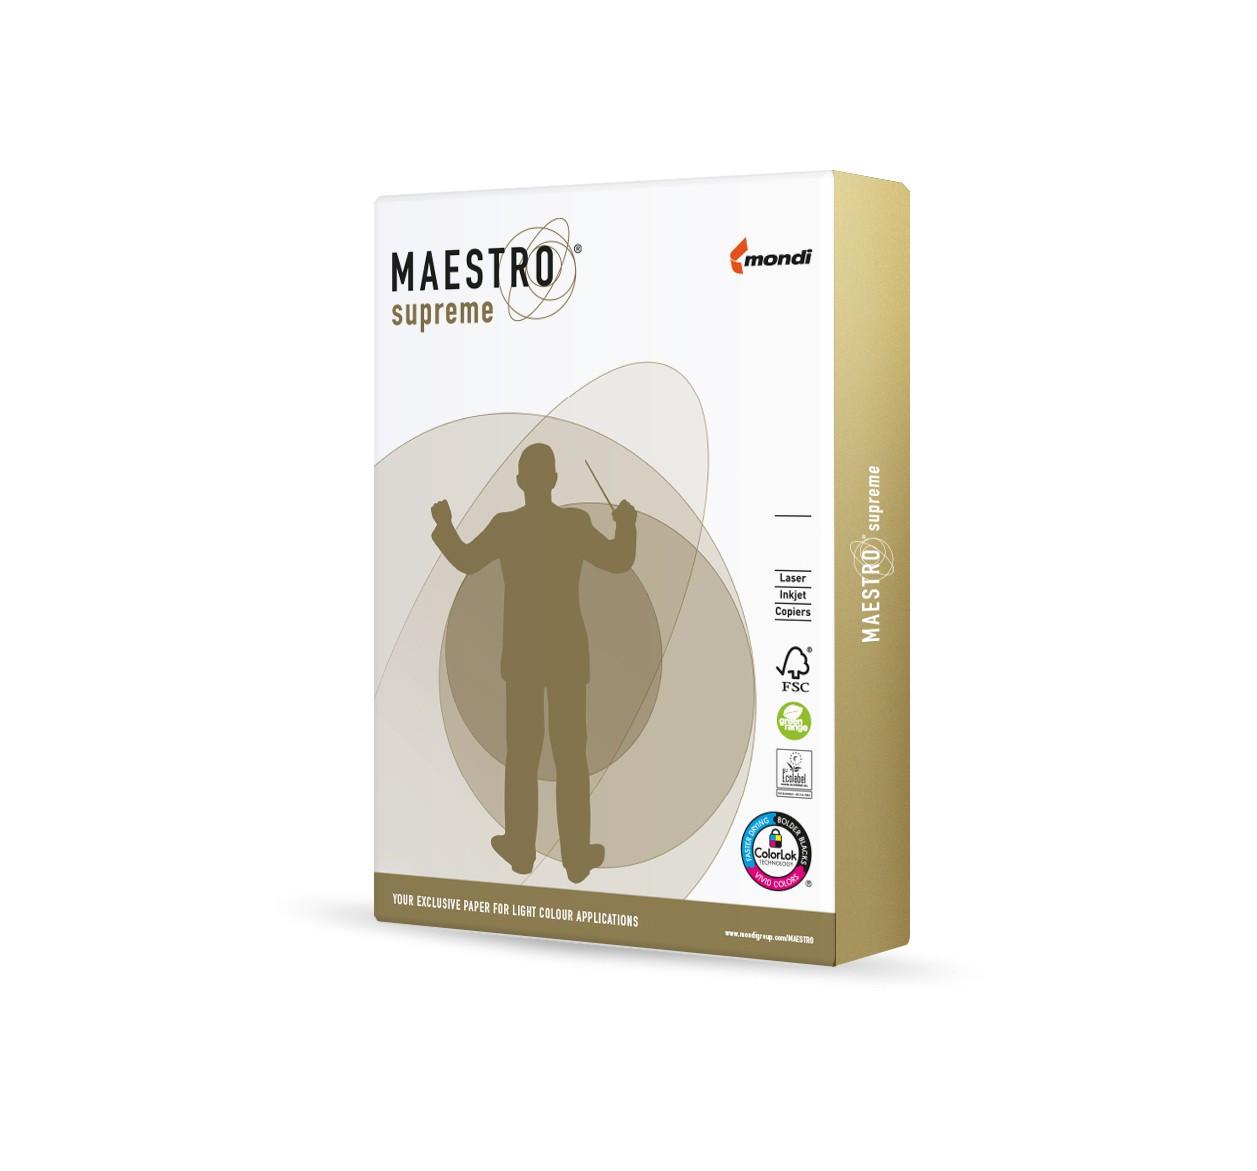 Maestro supreme Papier 100g/m² DIN-A4